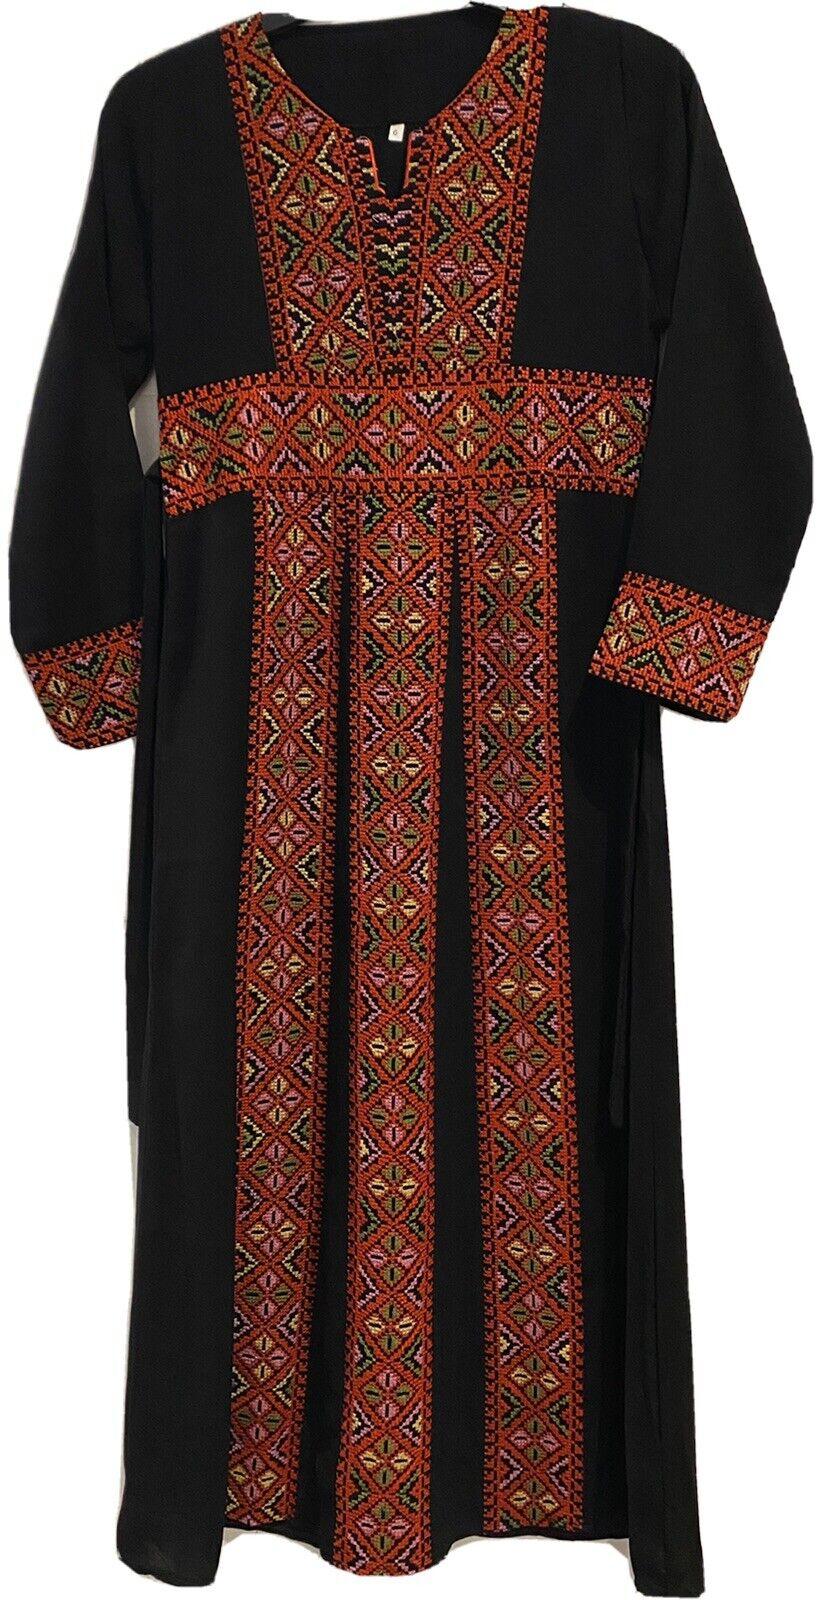 Girls Maxi Dress Eid Dress Jordanian Palestenian Thobe 10 12 Years Girls Long